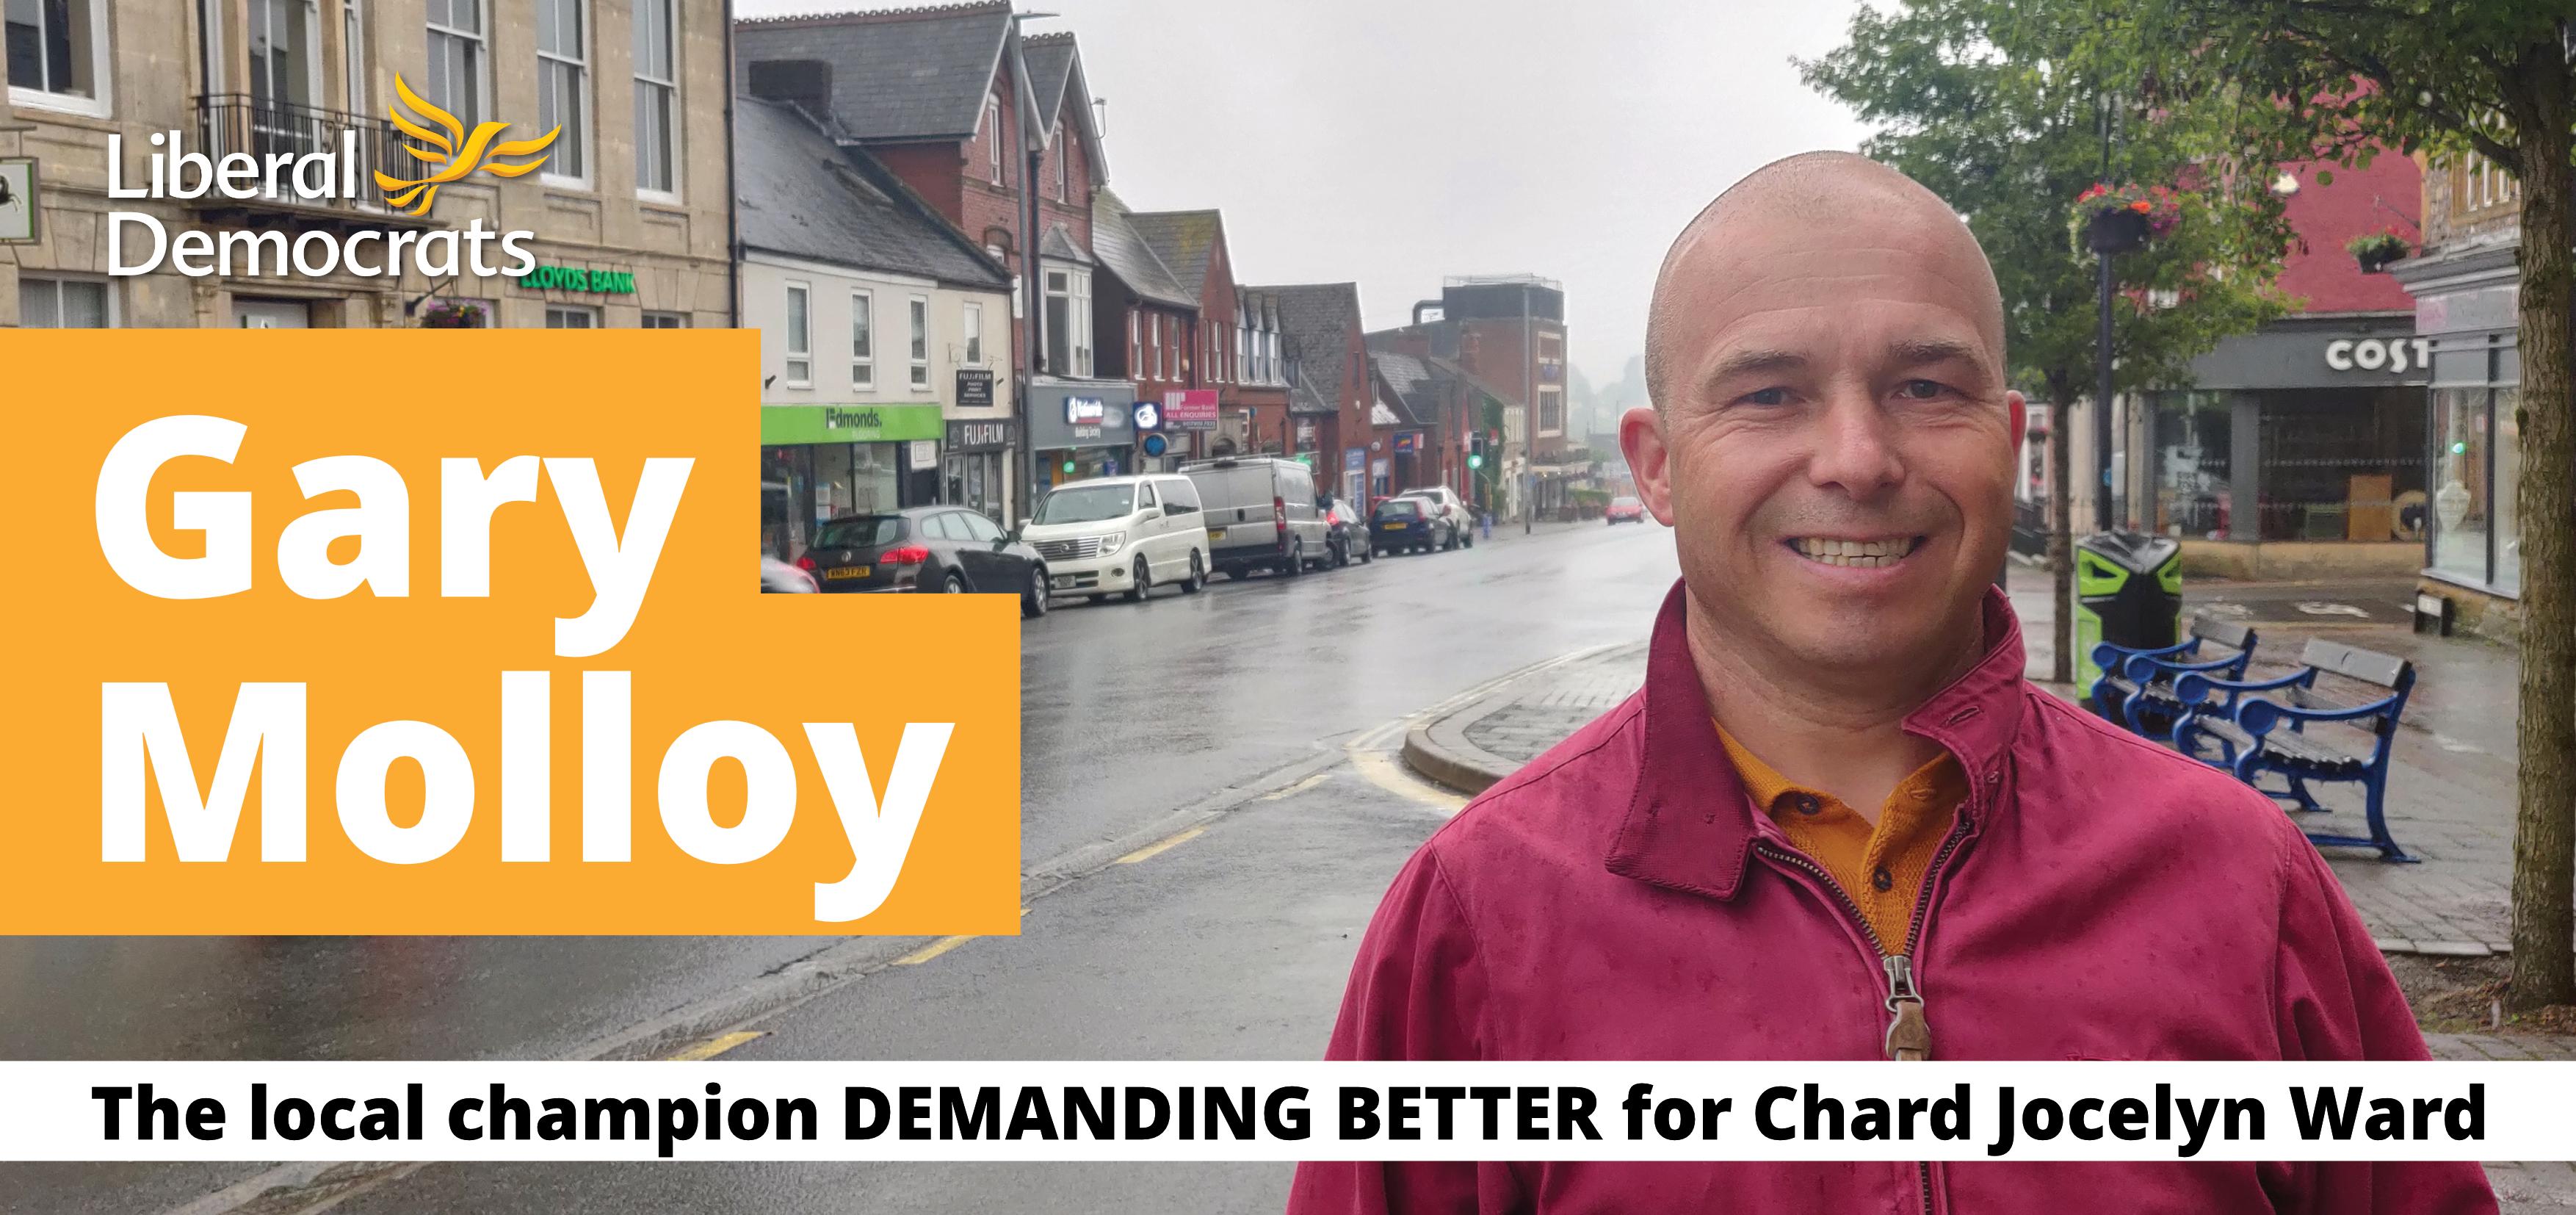 Gary Molloy - The Local champion demanding better for Chard Jocelyn Ward